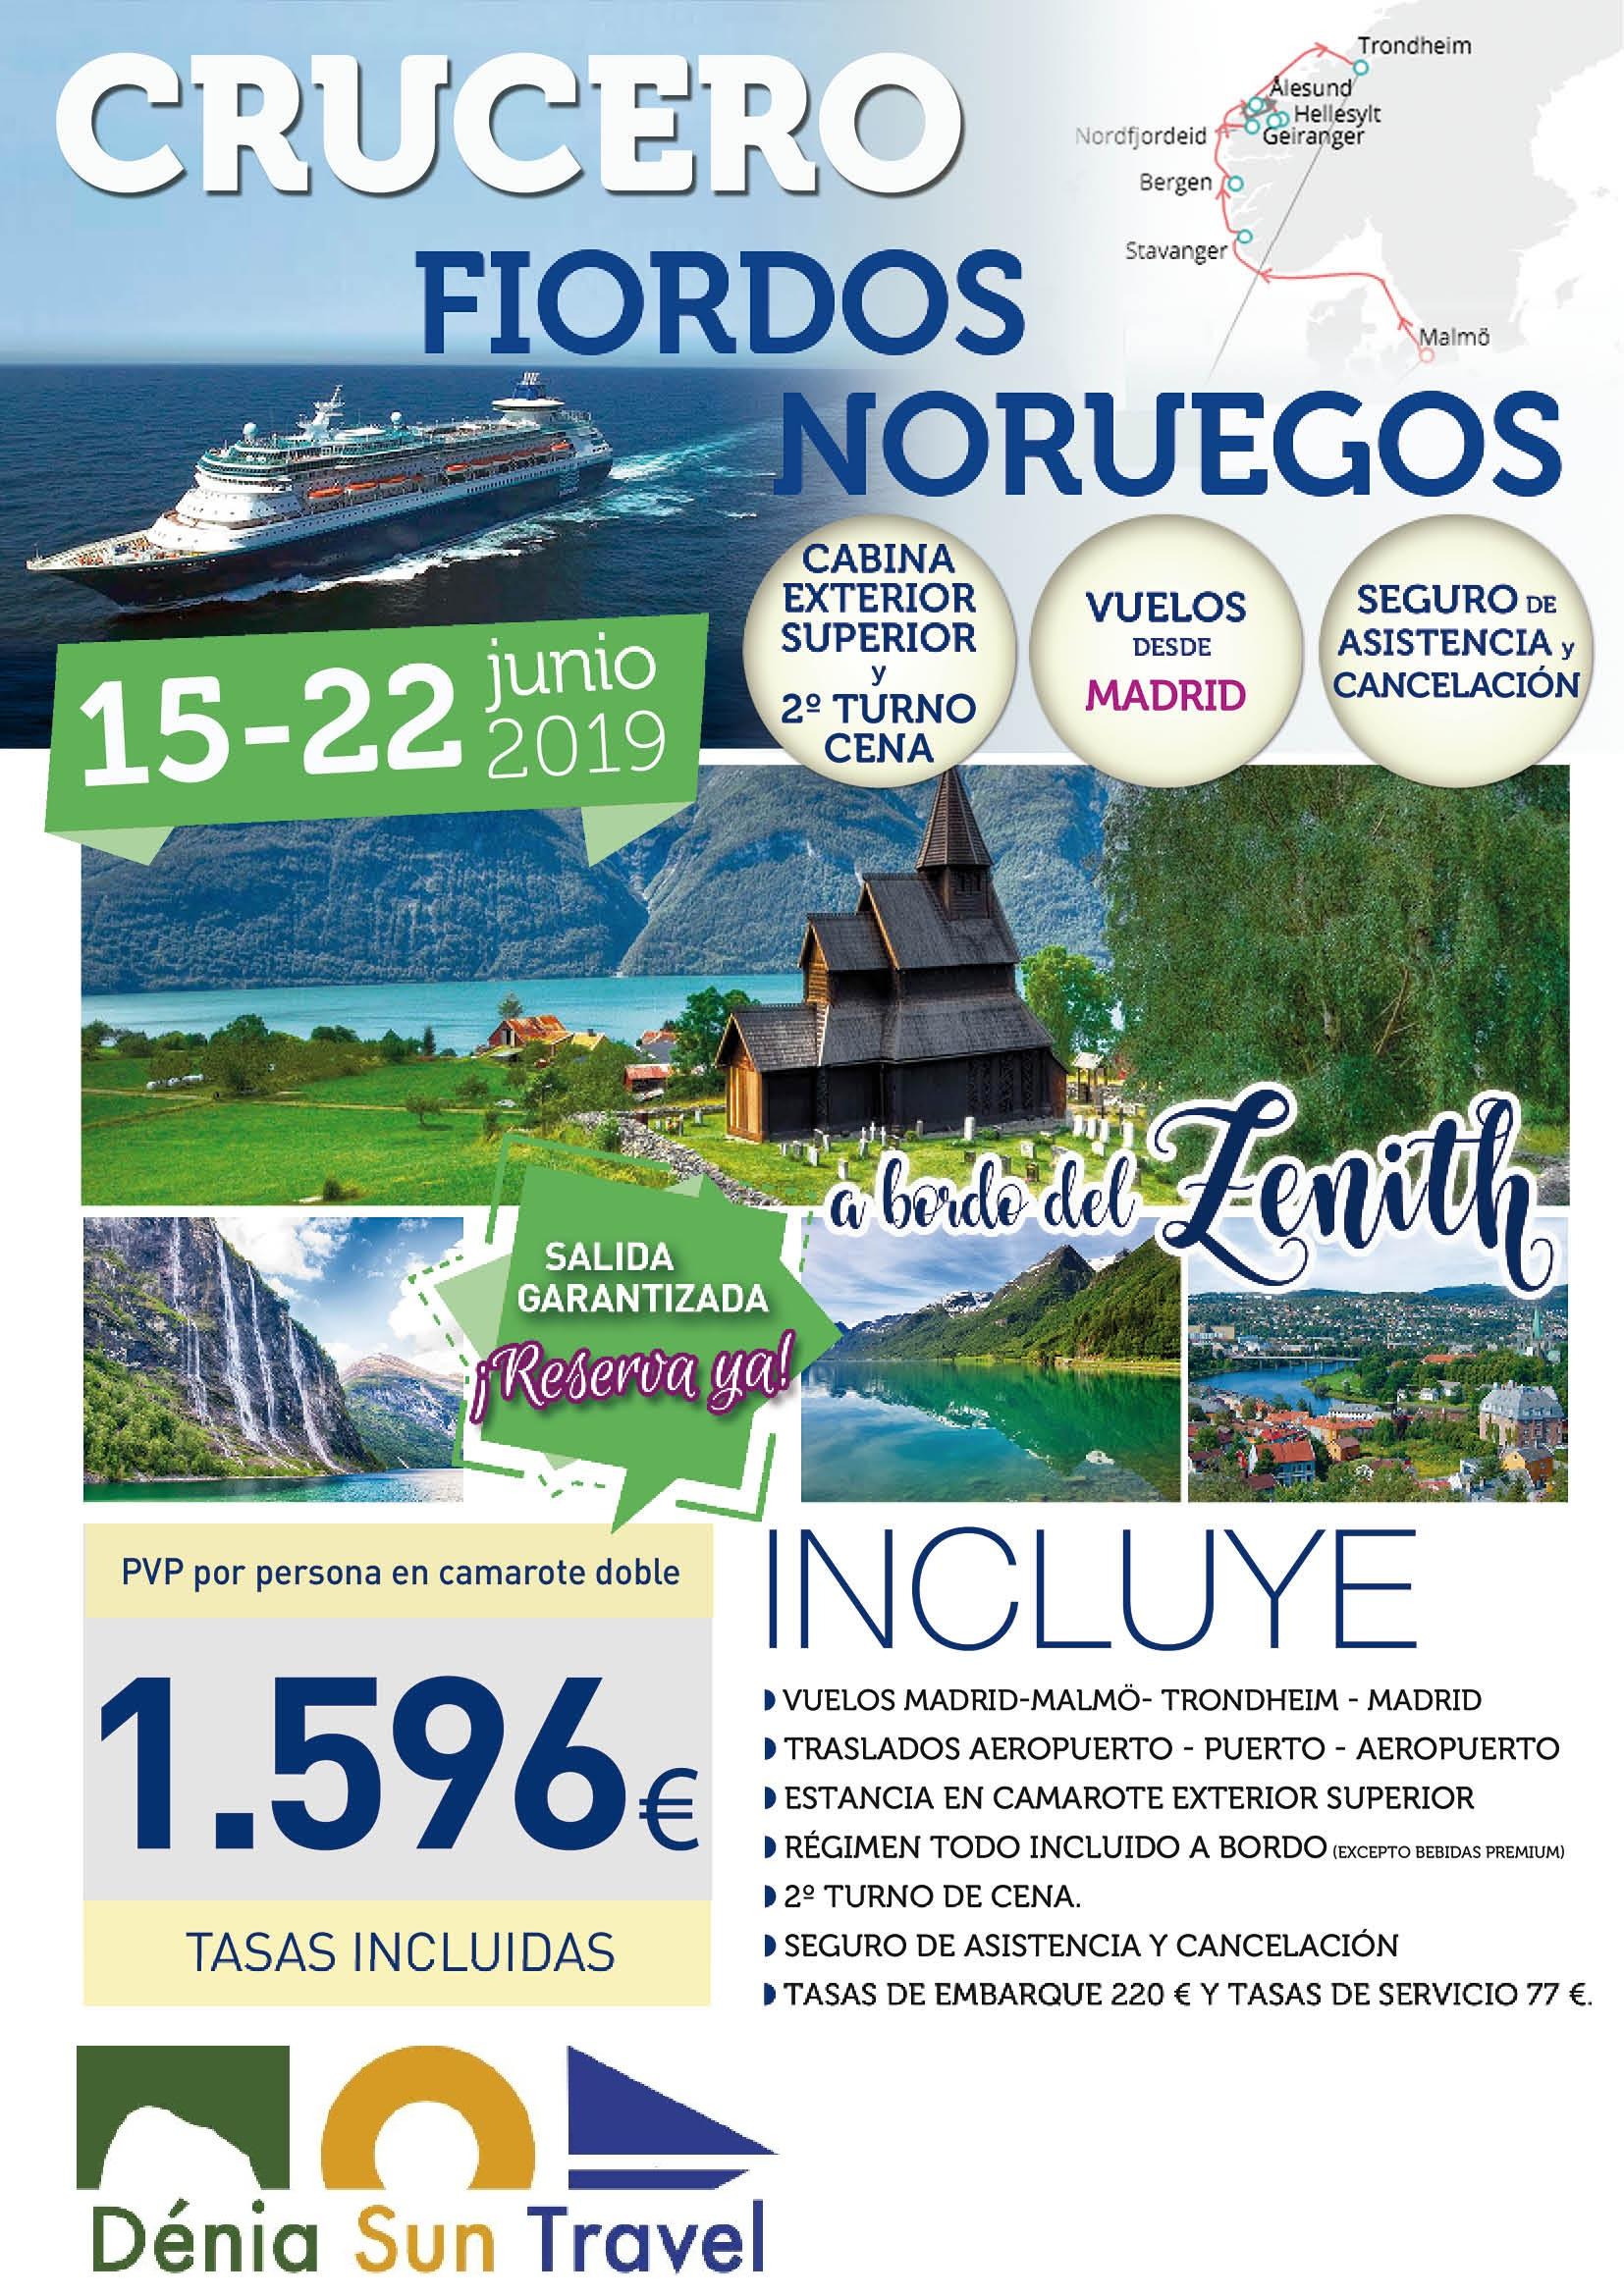 Crucero Fiordos 15 Junio desde MADÑÑ